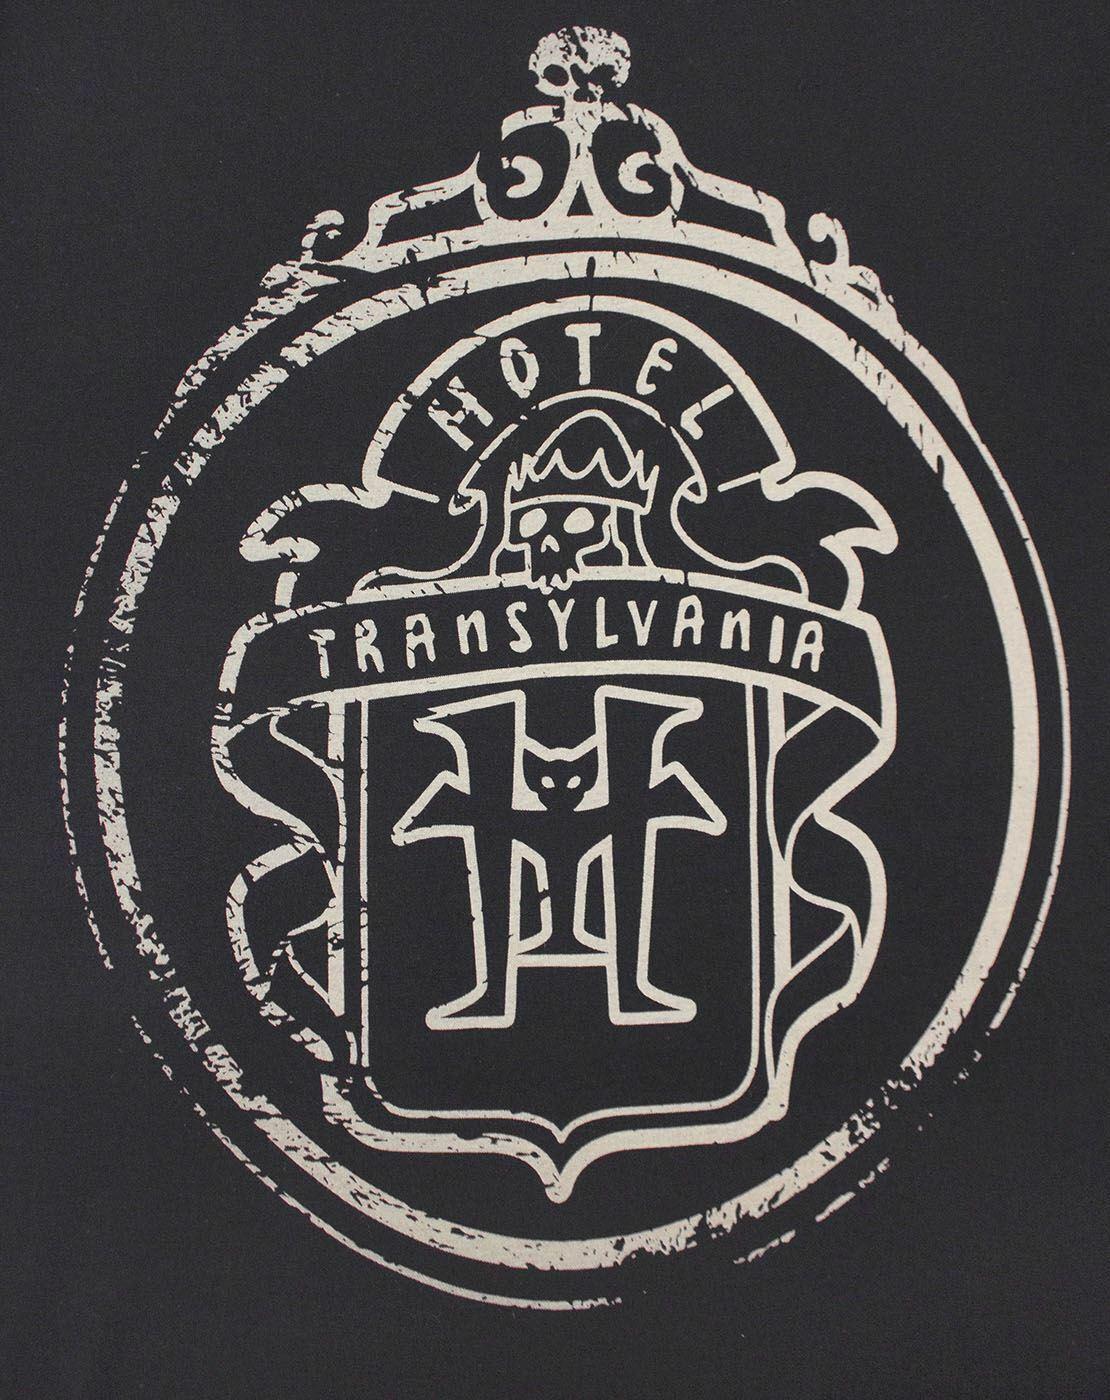 thumbnail 8 - Hotel-Transylvania-Logo-Glow-In-The-Dark-Women-039-s-T-Shirt